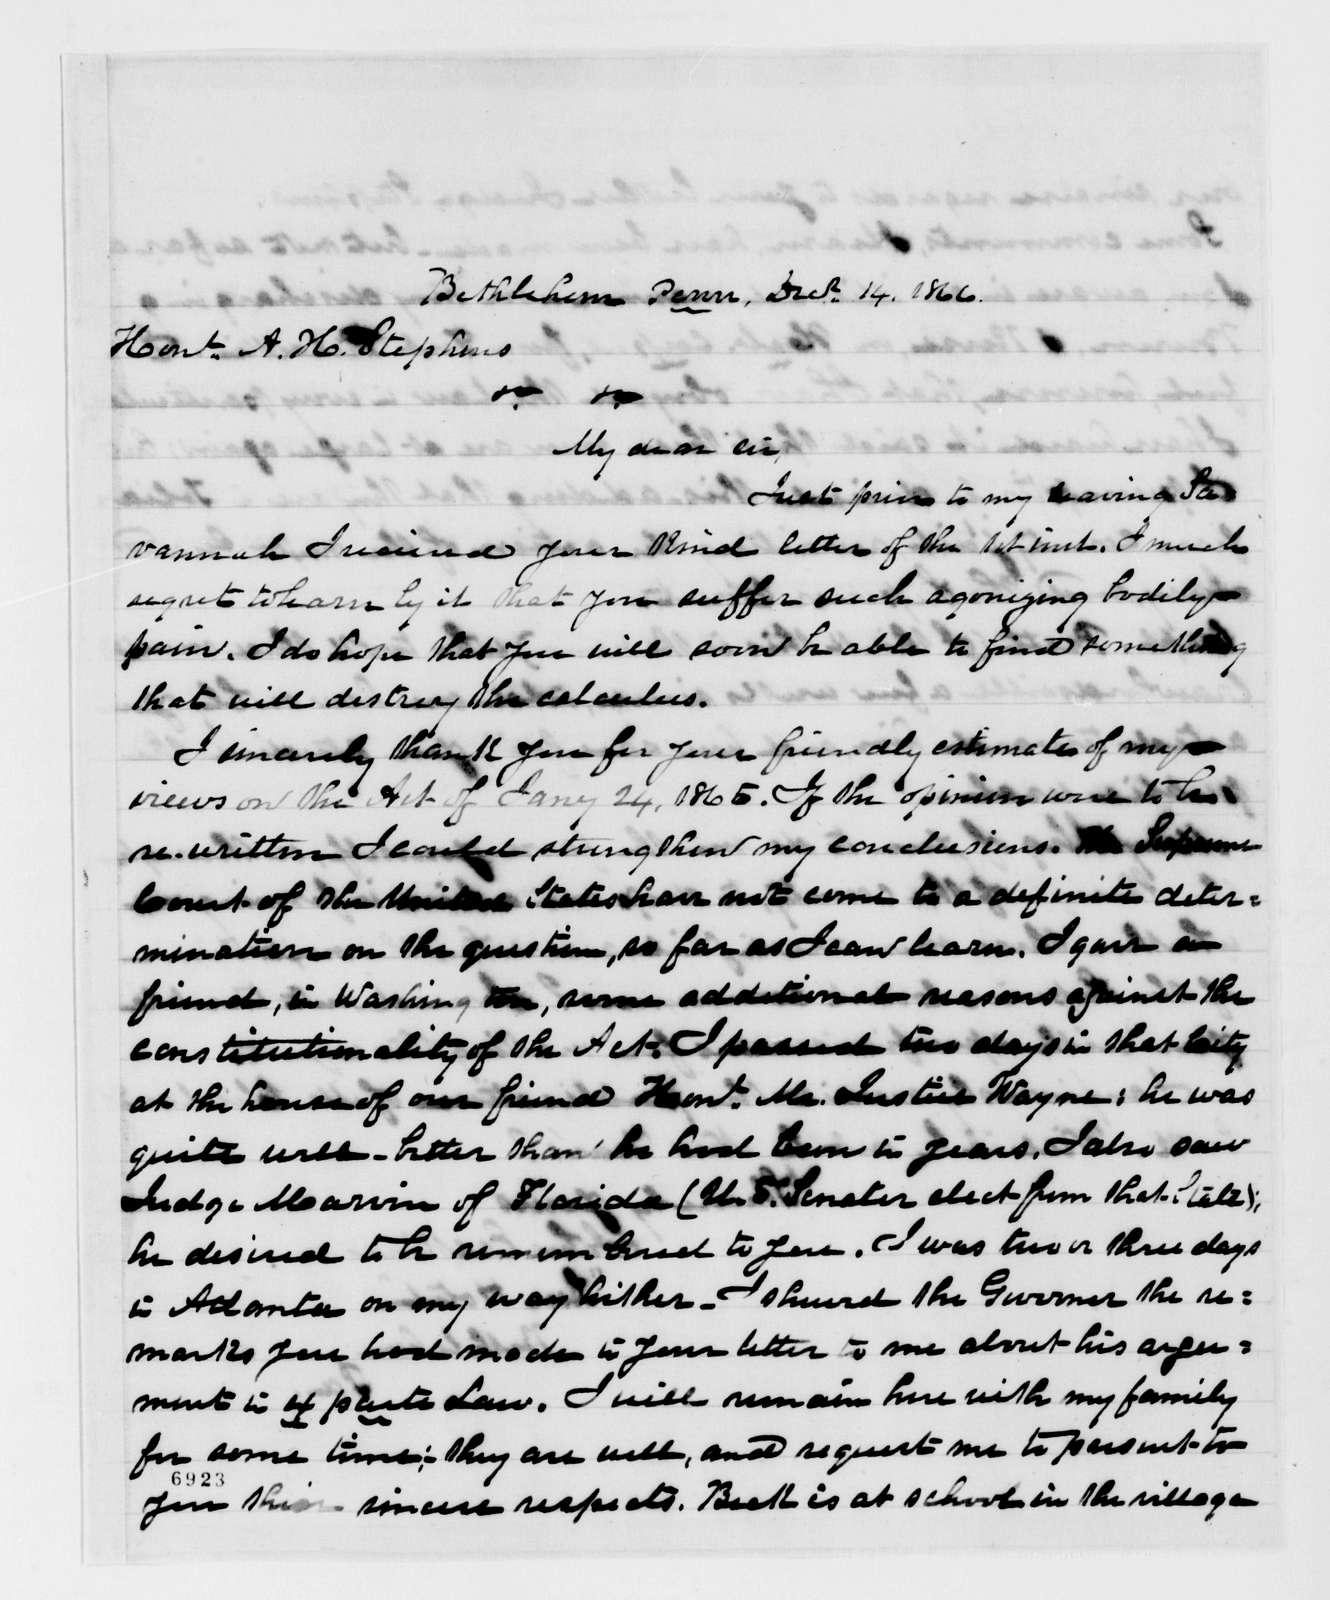 Alexander Hamilton Stephens Papers: General Correspondence, 1784-1886; 1866, Sept. 21-1867, Jan. 8